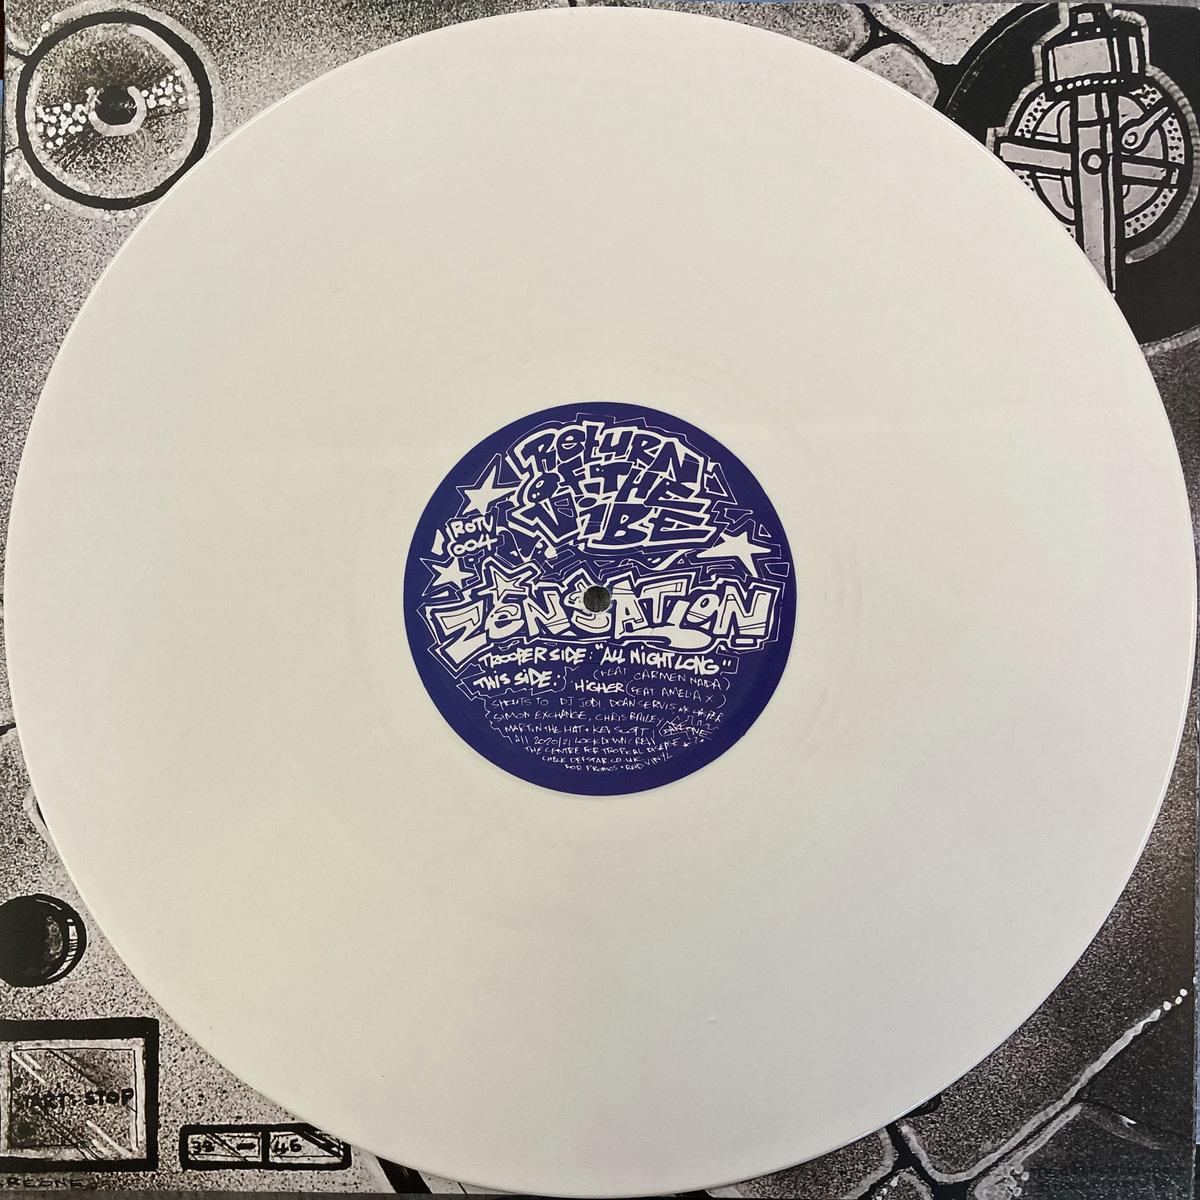 Download Zensation - All Night Long / Higher mp3